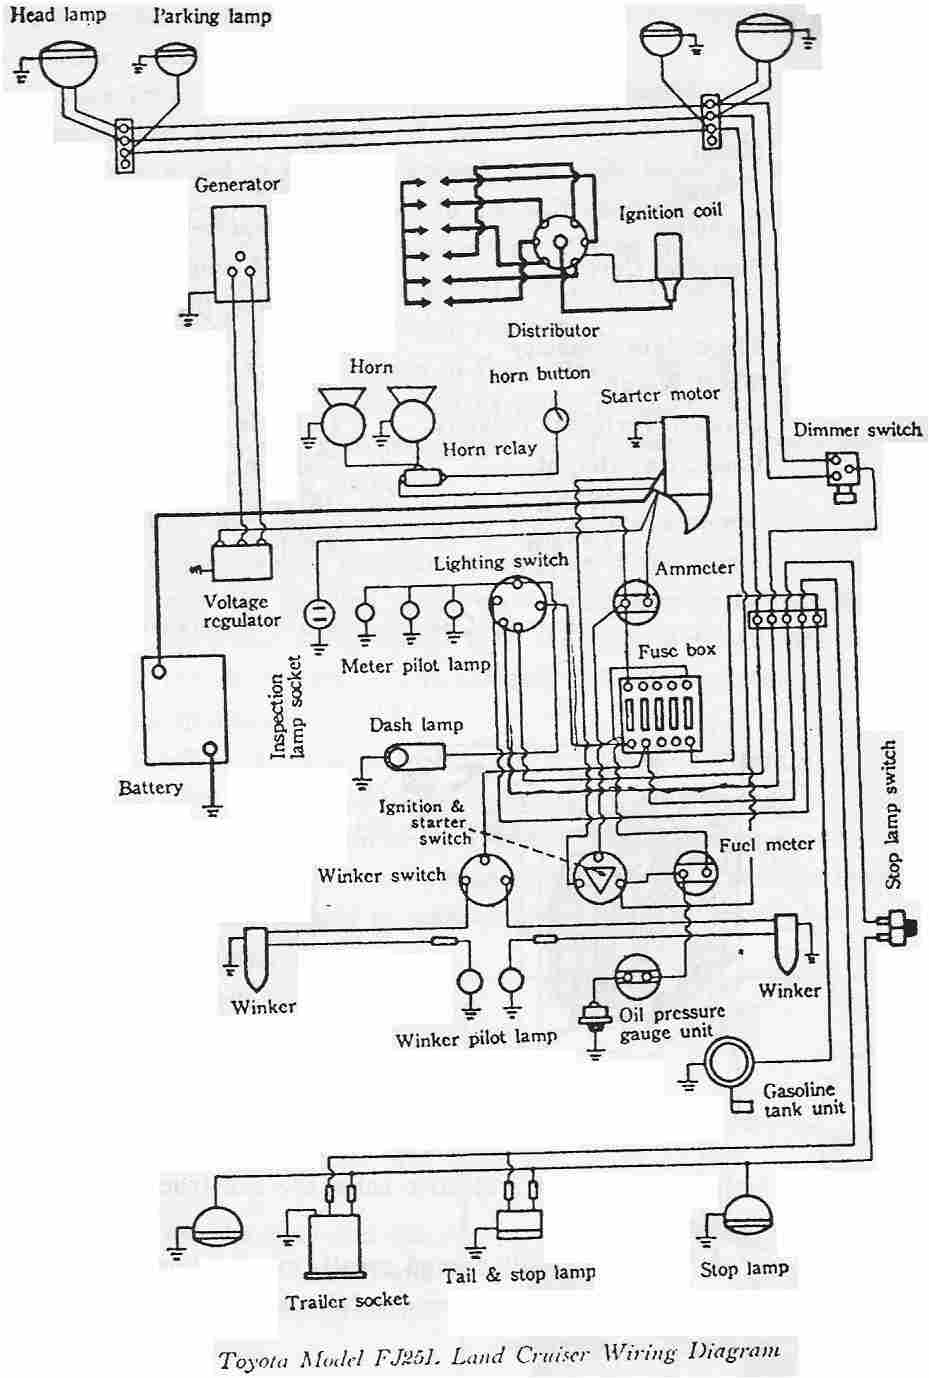 2005 sienna wiring diagrams [ 929 x 1378 Pixel ]